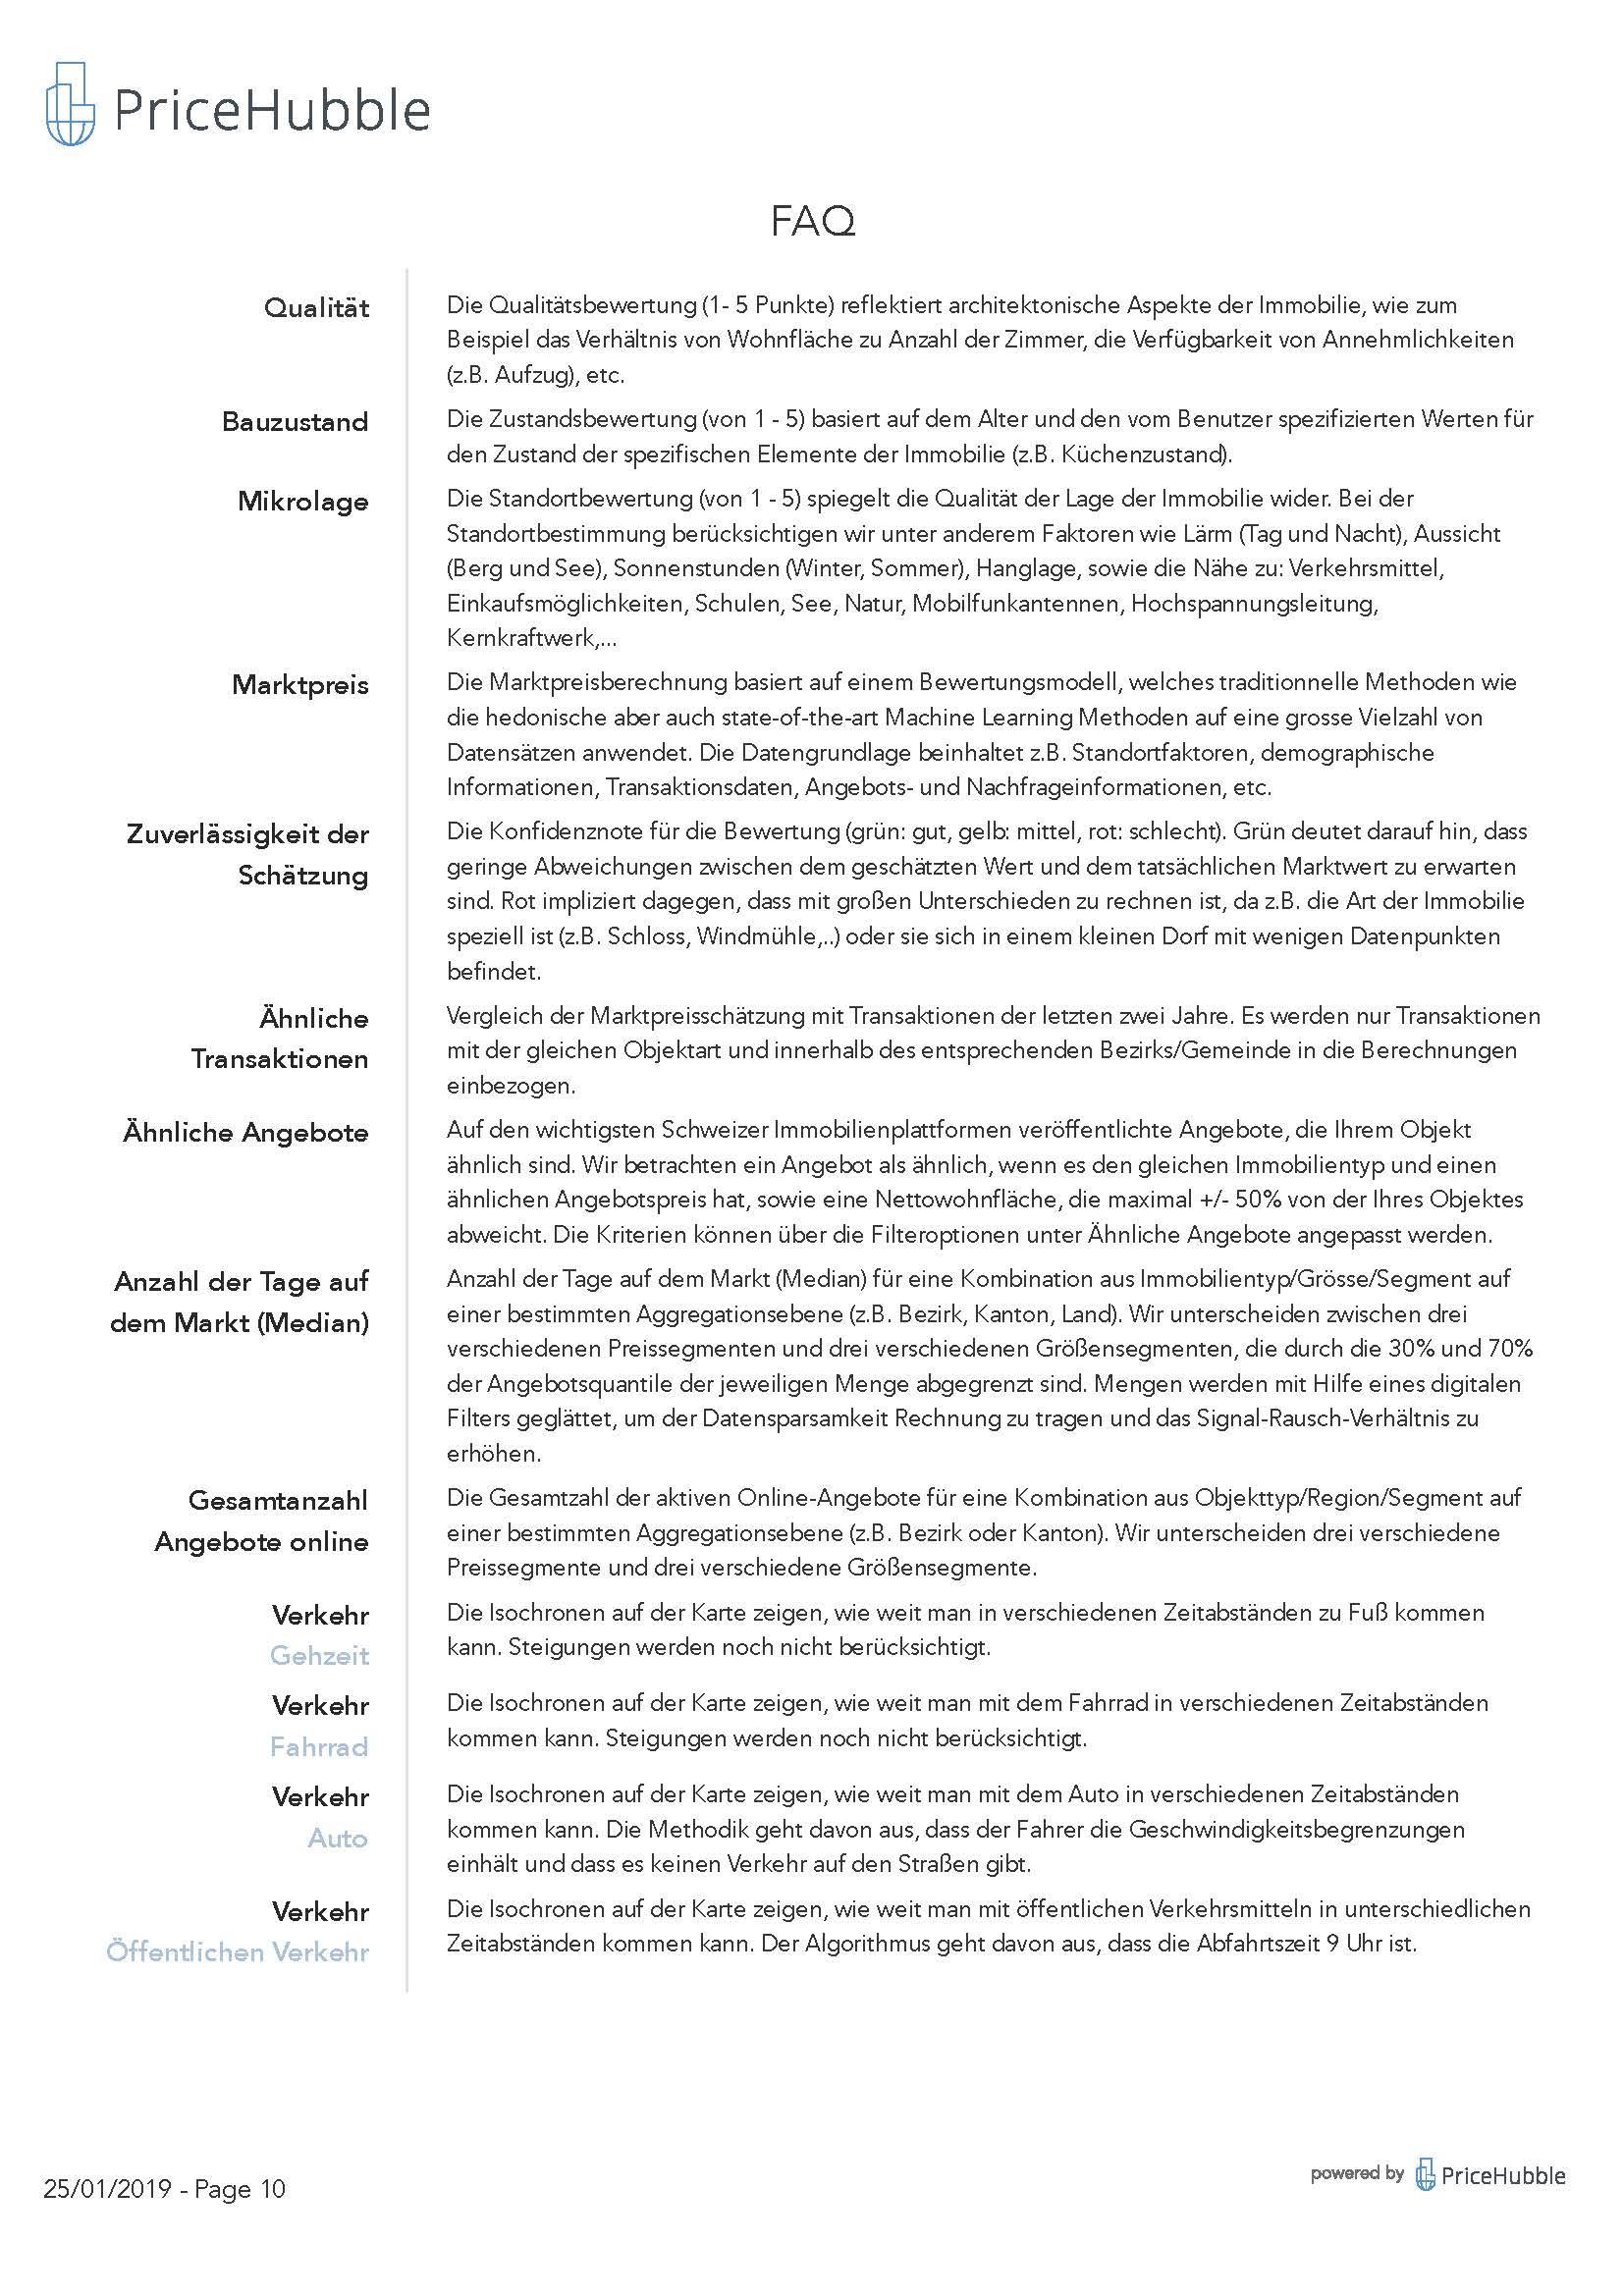 PriceHubble_Valuation_Report_House_Unnothstrasse_12_Sankt-Margrethen_2019-01-25-3_Seite_10.jpg